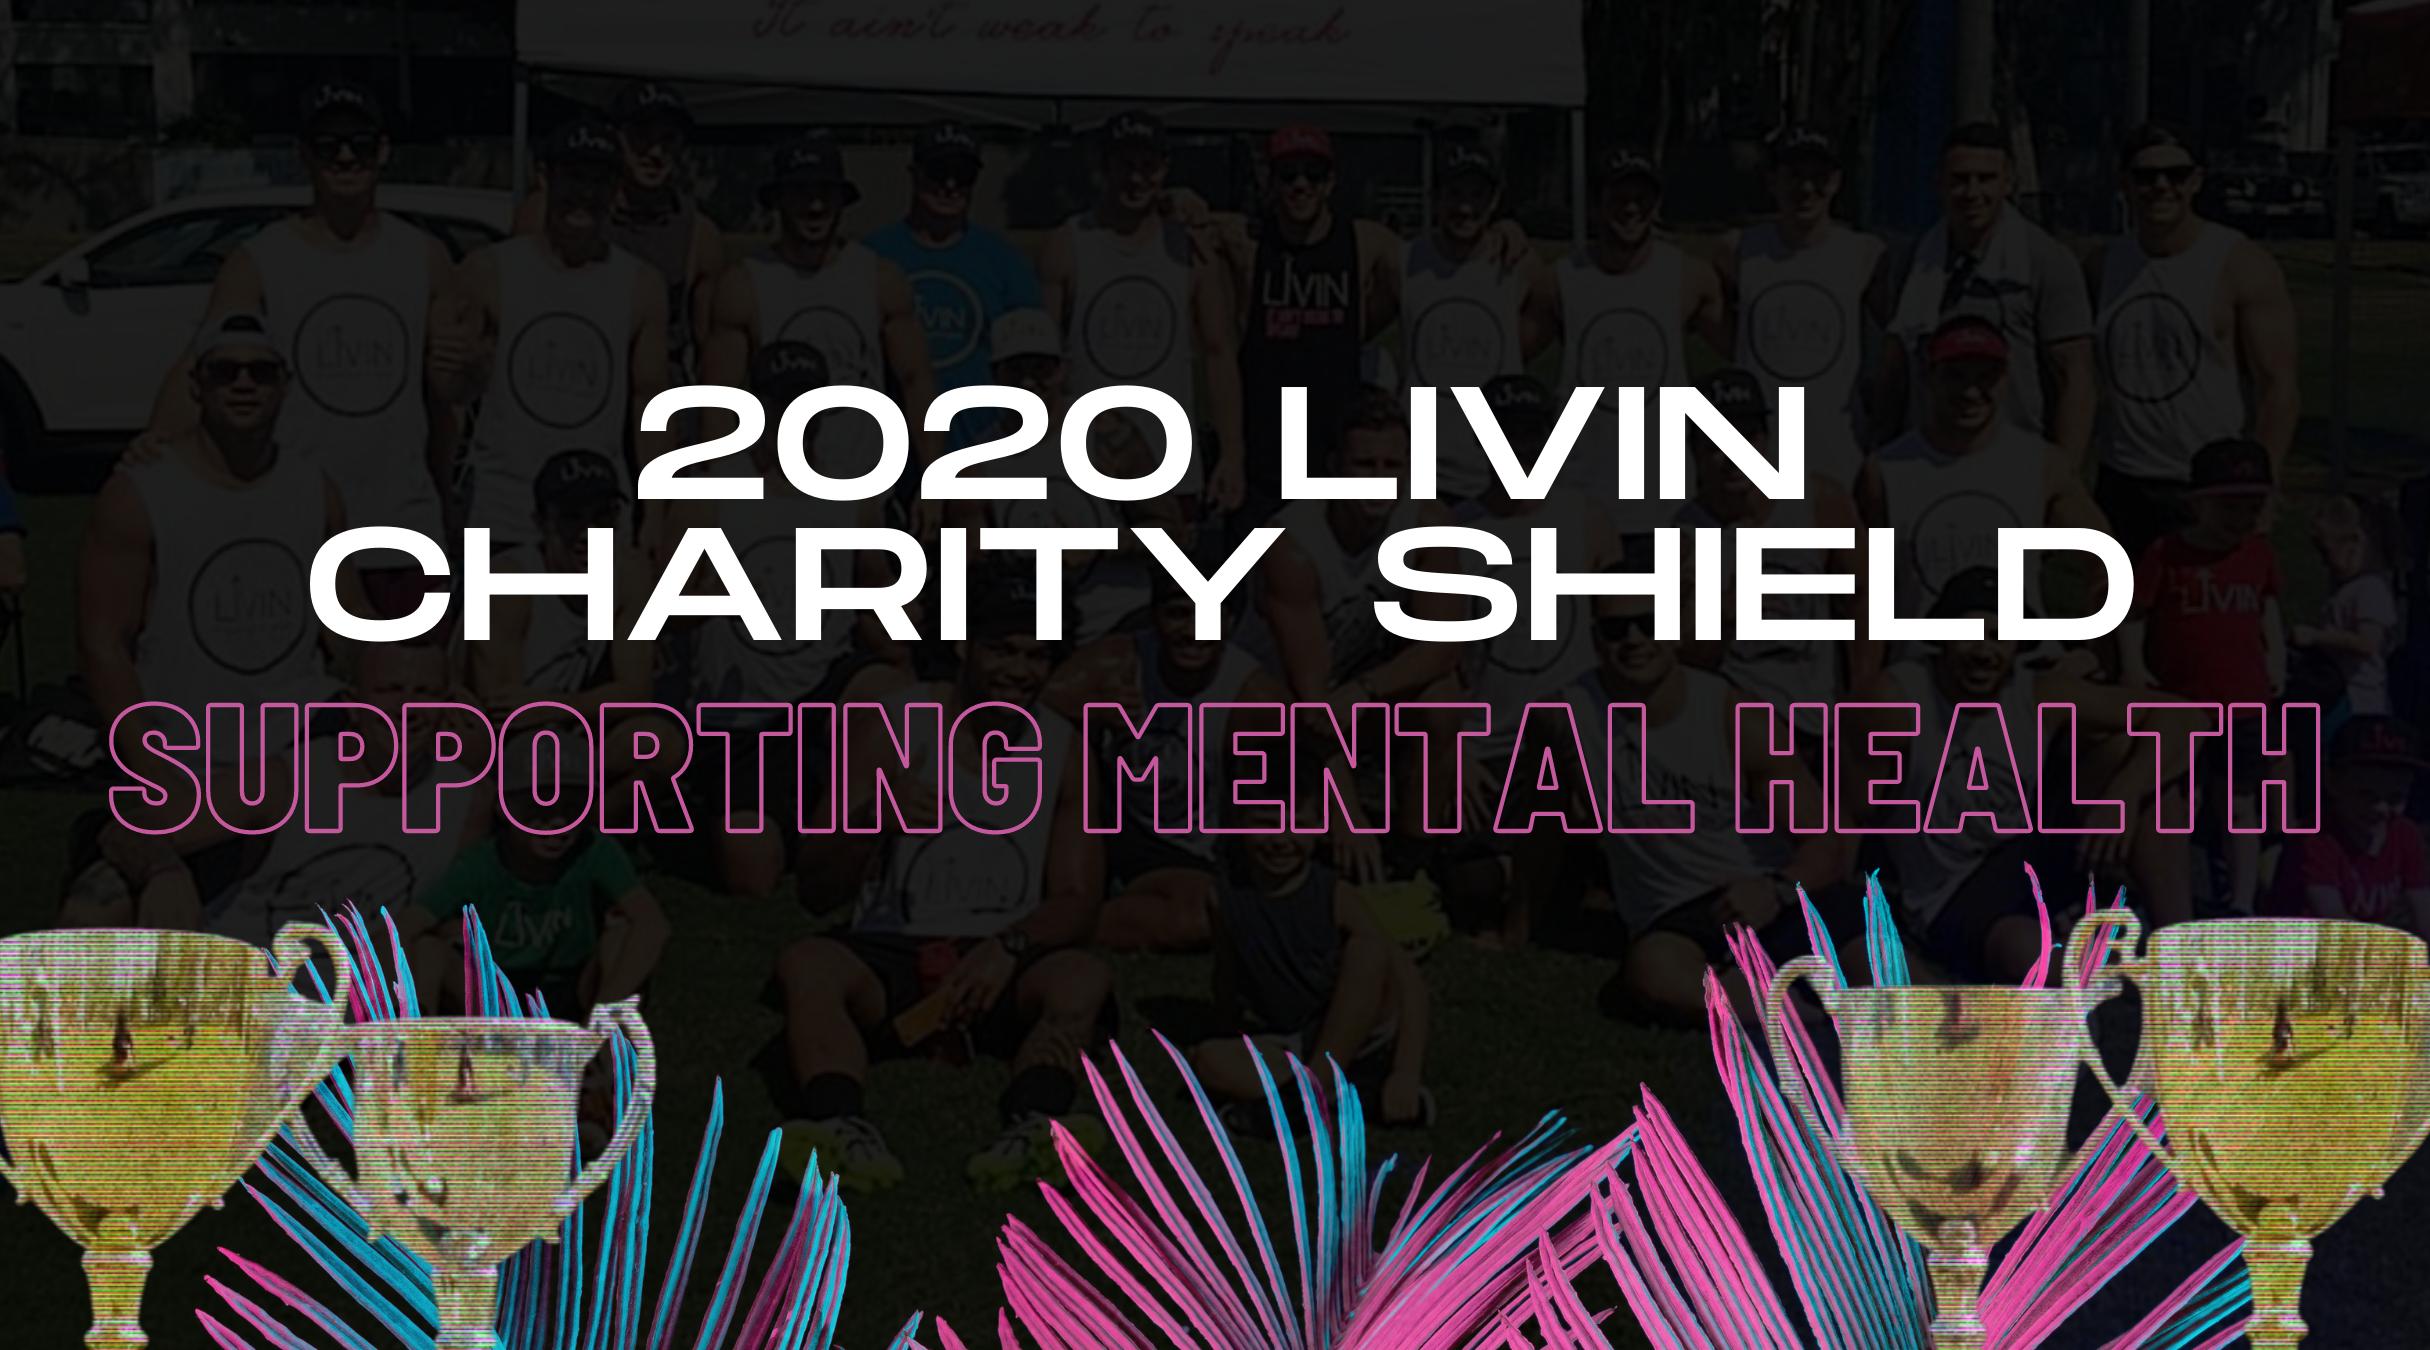 2020 LIVIN Charity Shield